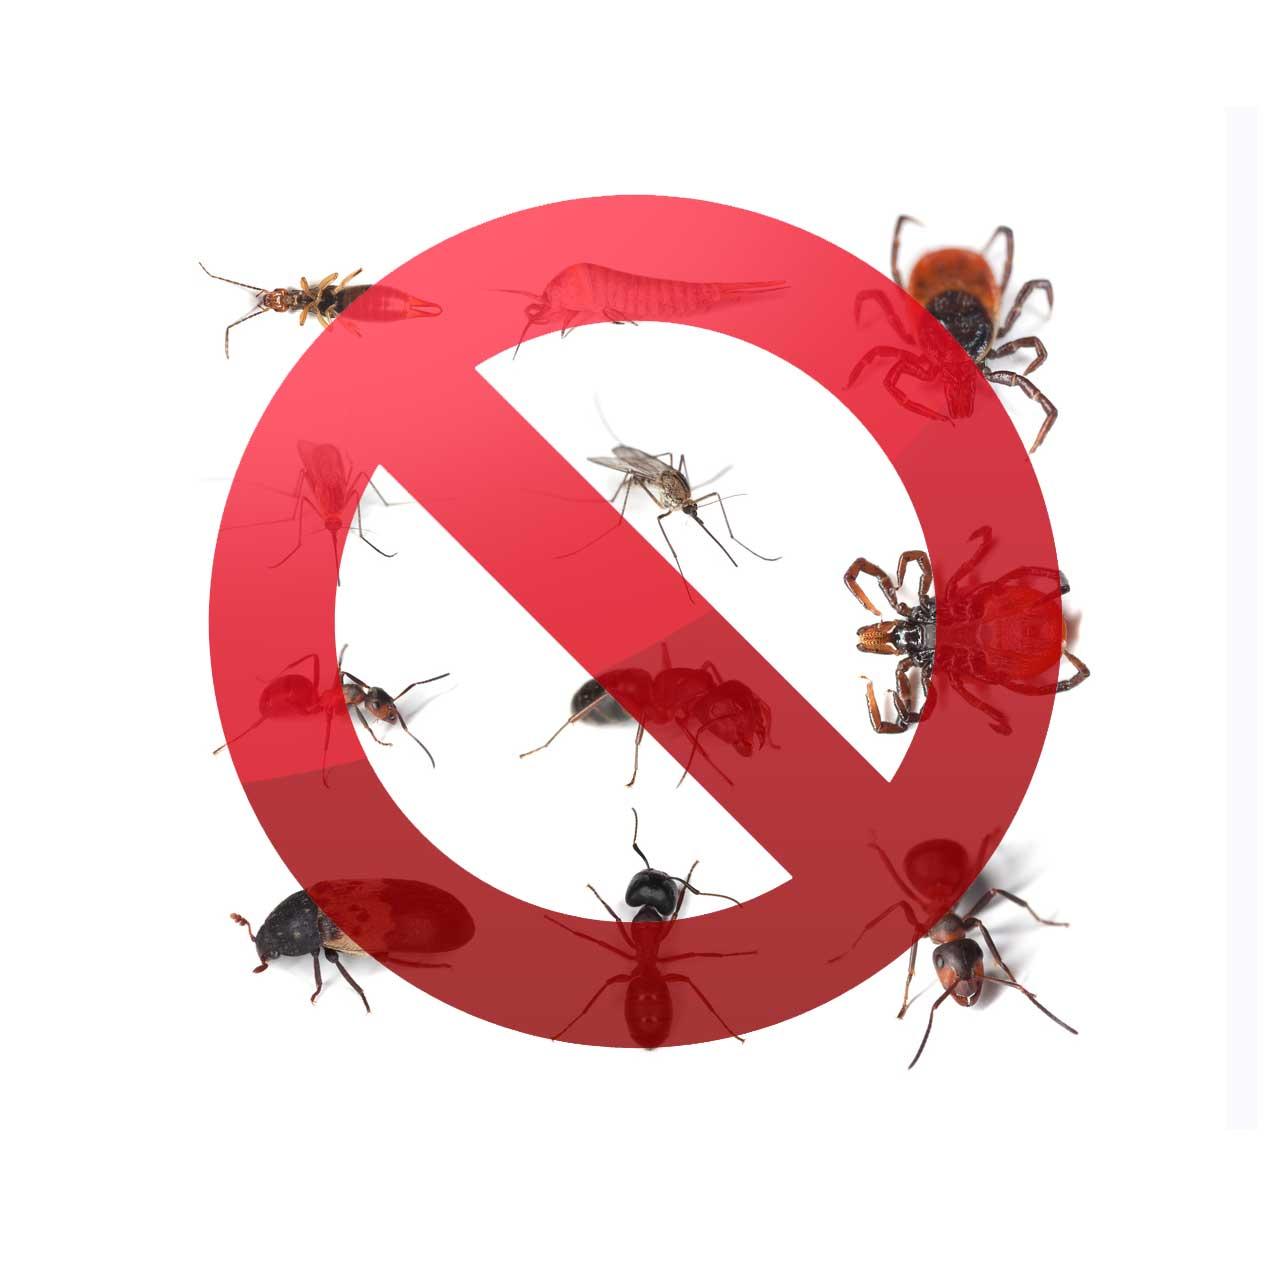 Termitecom Termites Termite Control Options